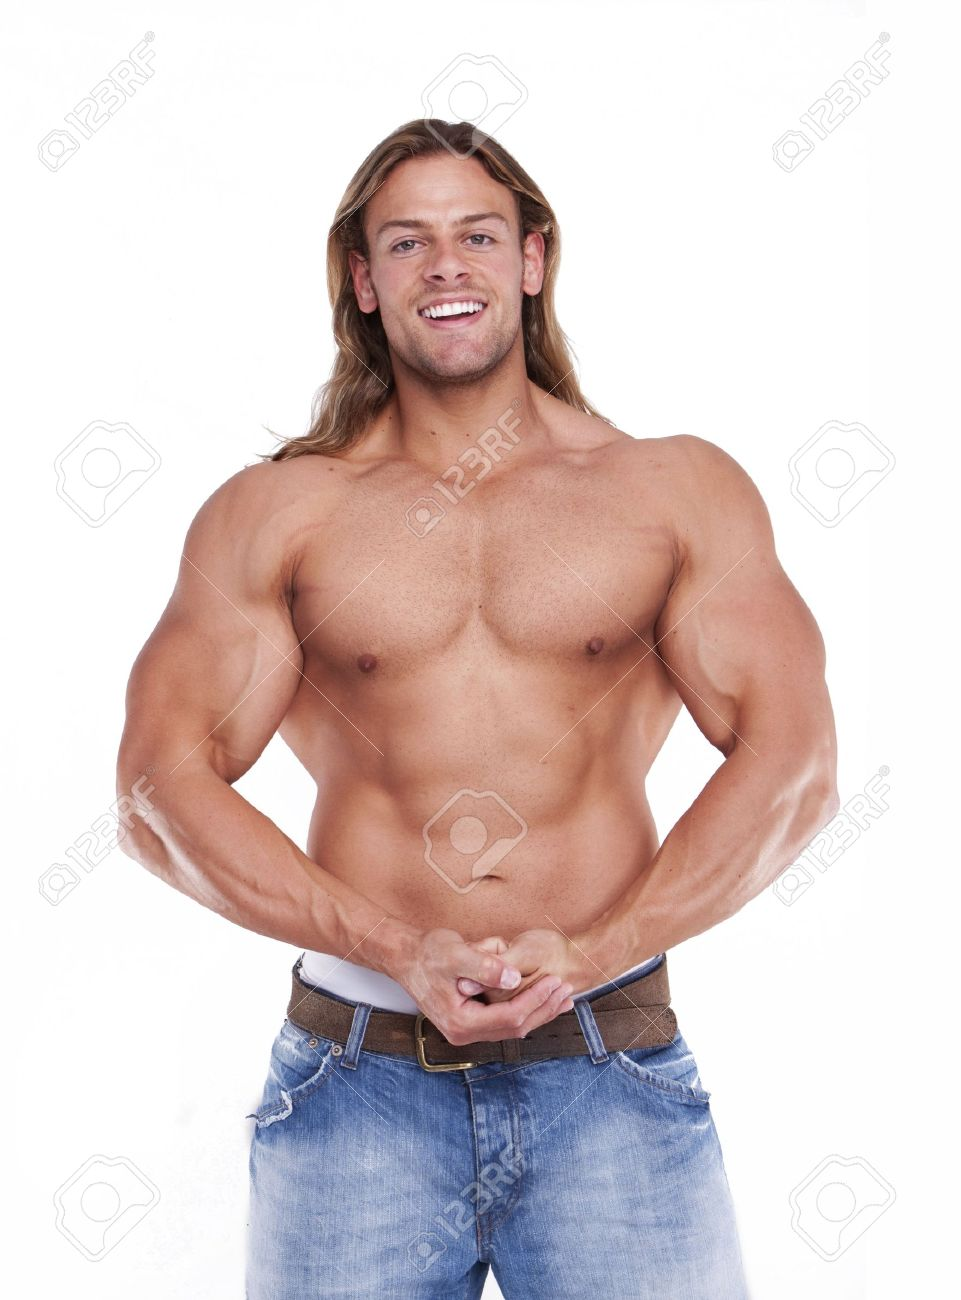 Hot male body photo